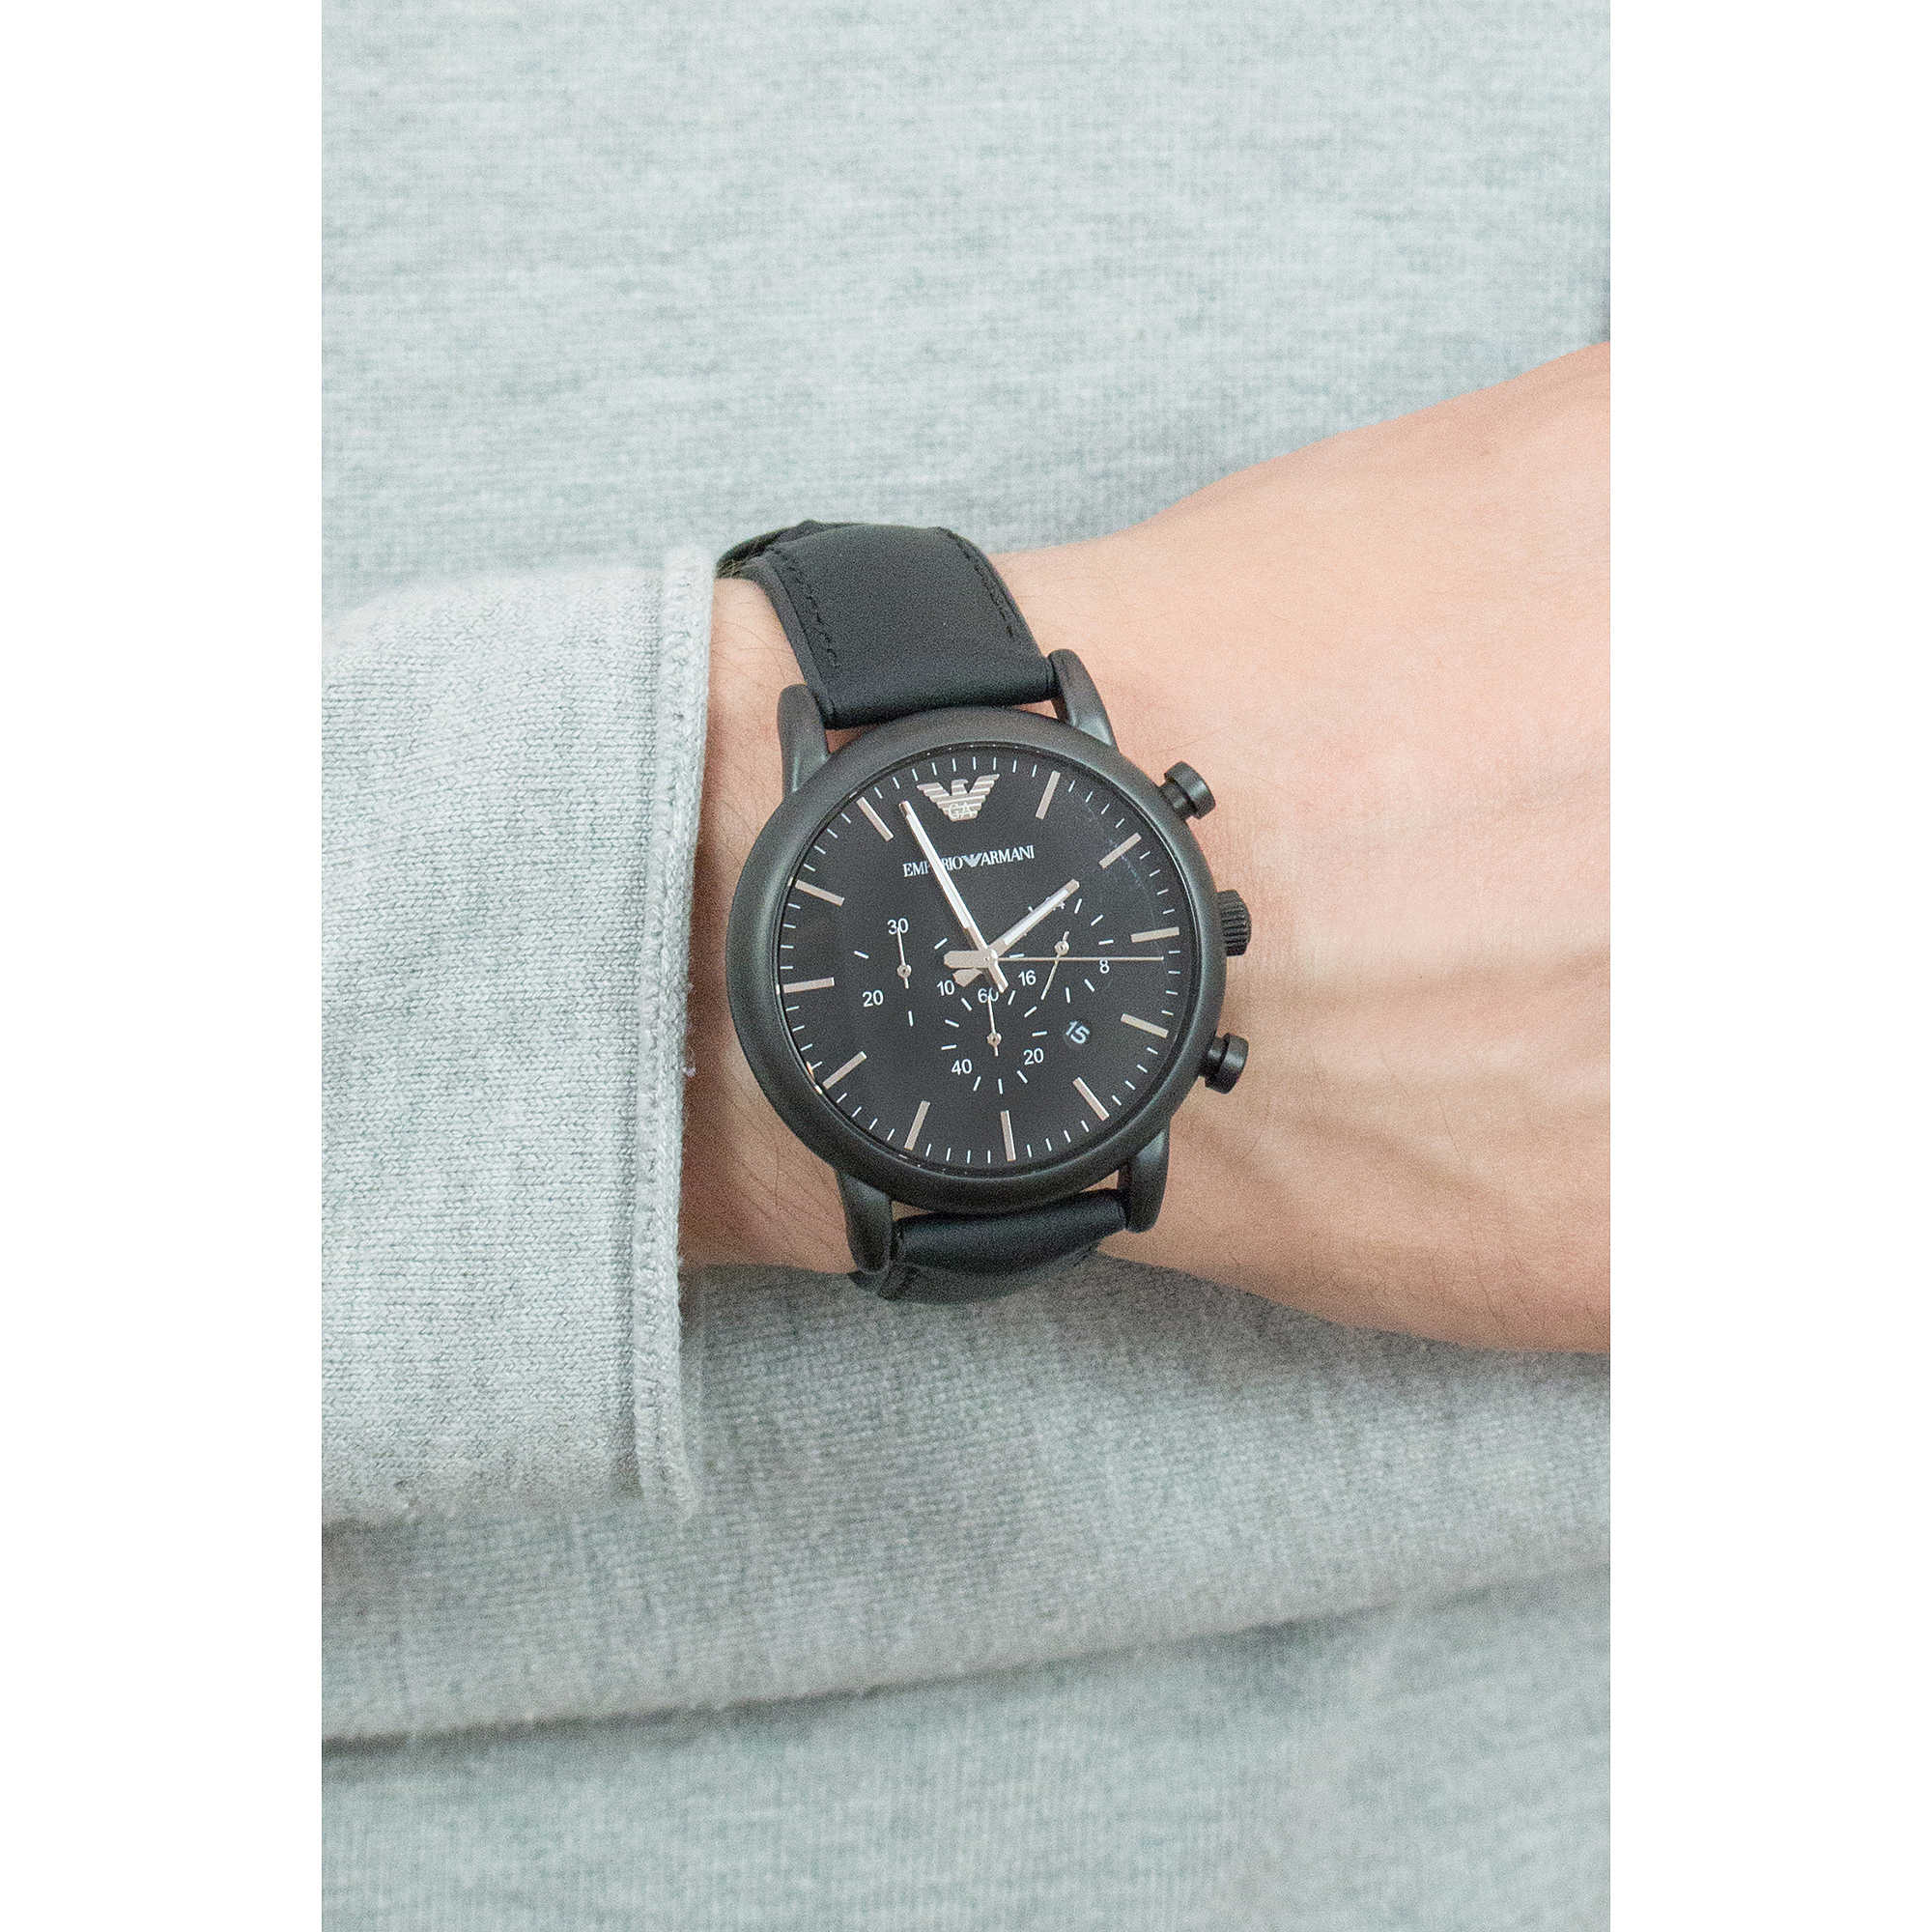 ad48c6b3e157 montre chronographe homme Emporio Armani AR1970 chronographes ...